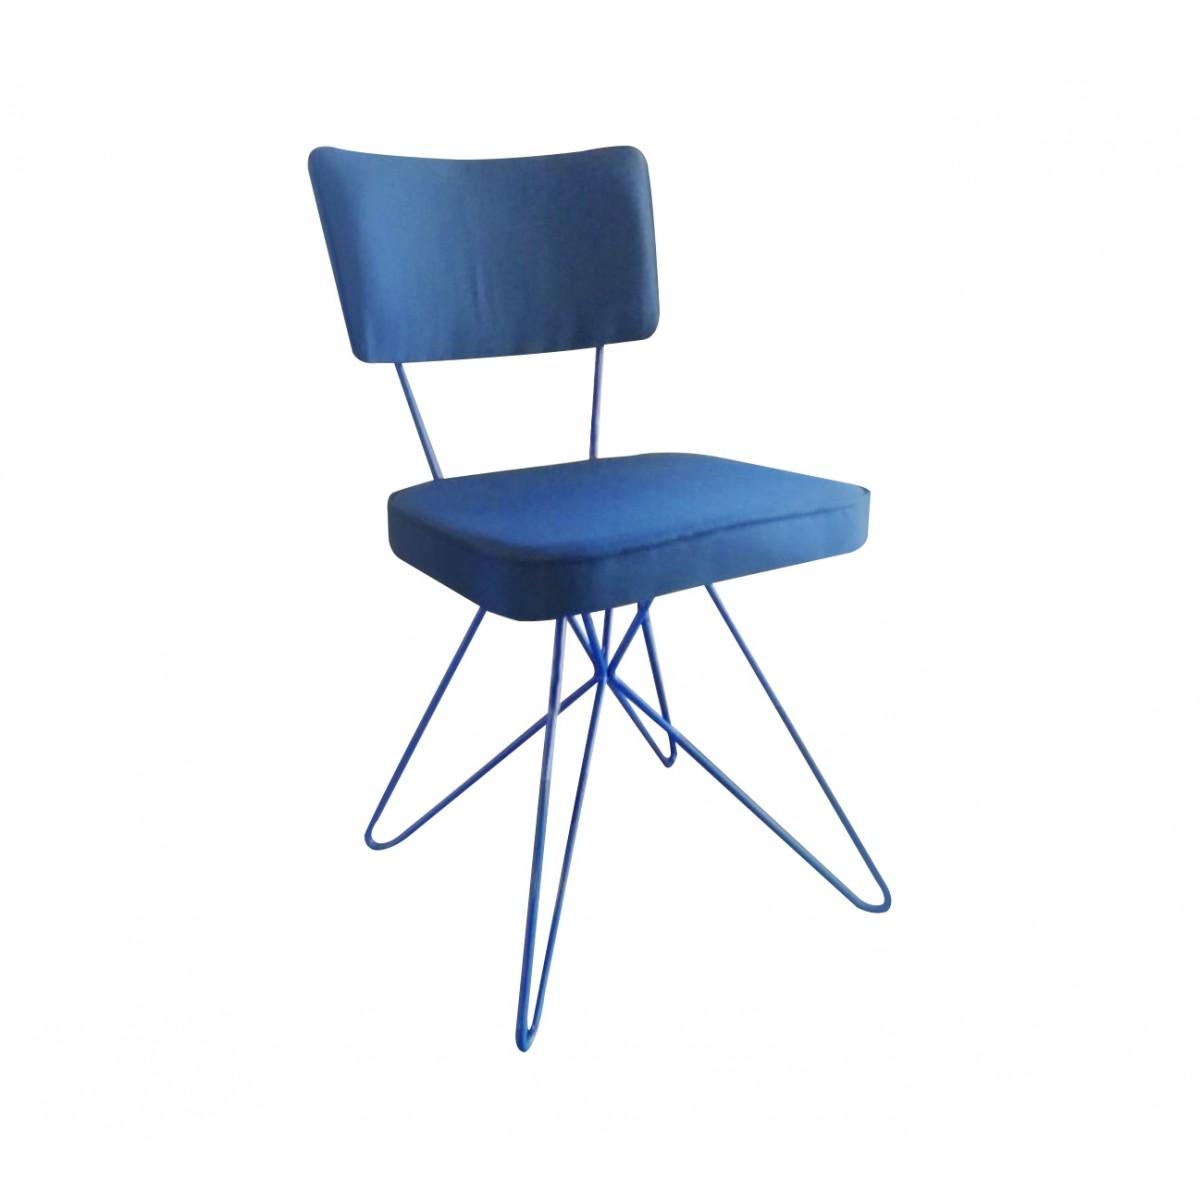 Cadeira Butterfly Retro Azul  - N Store